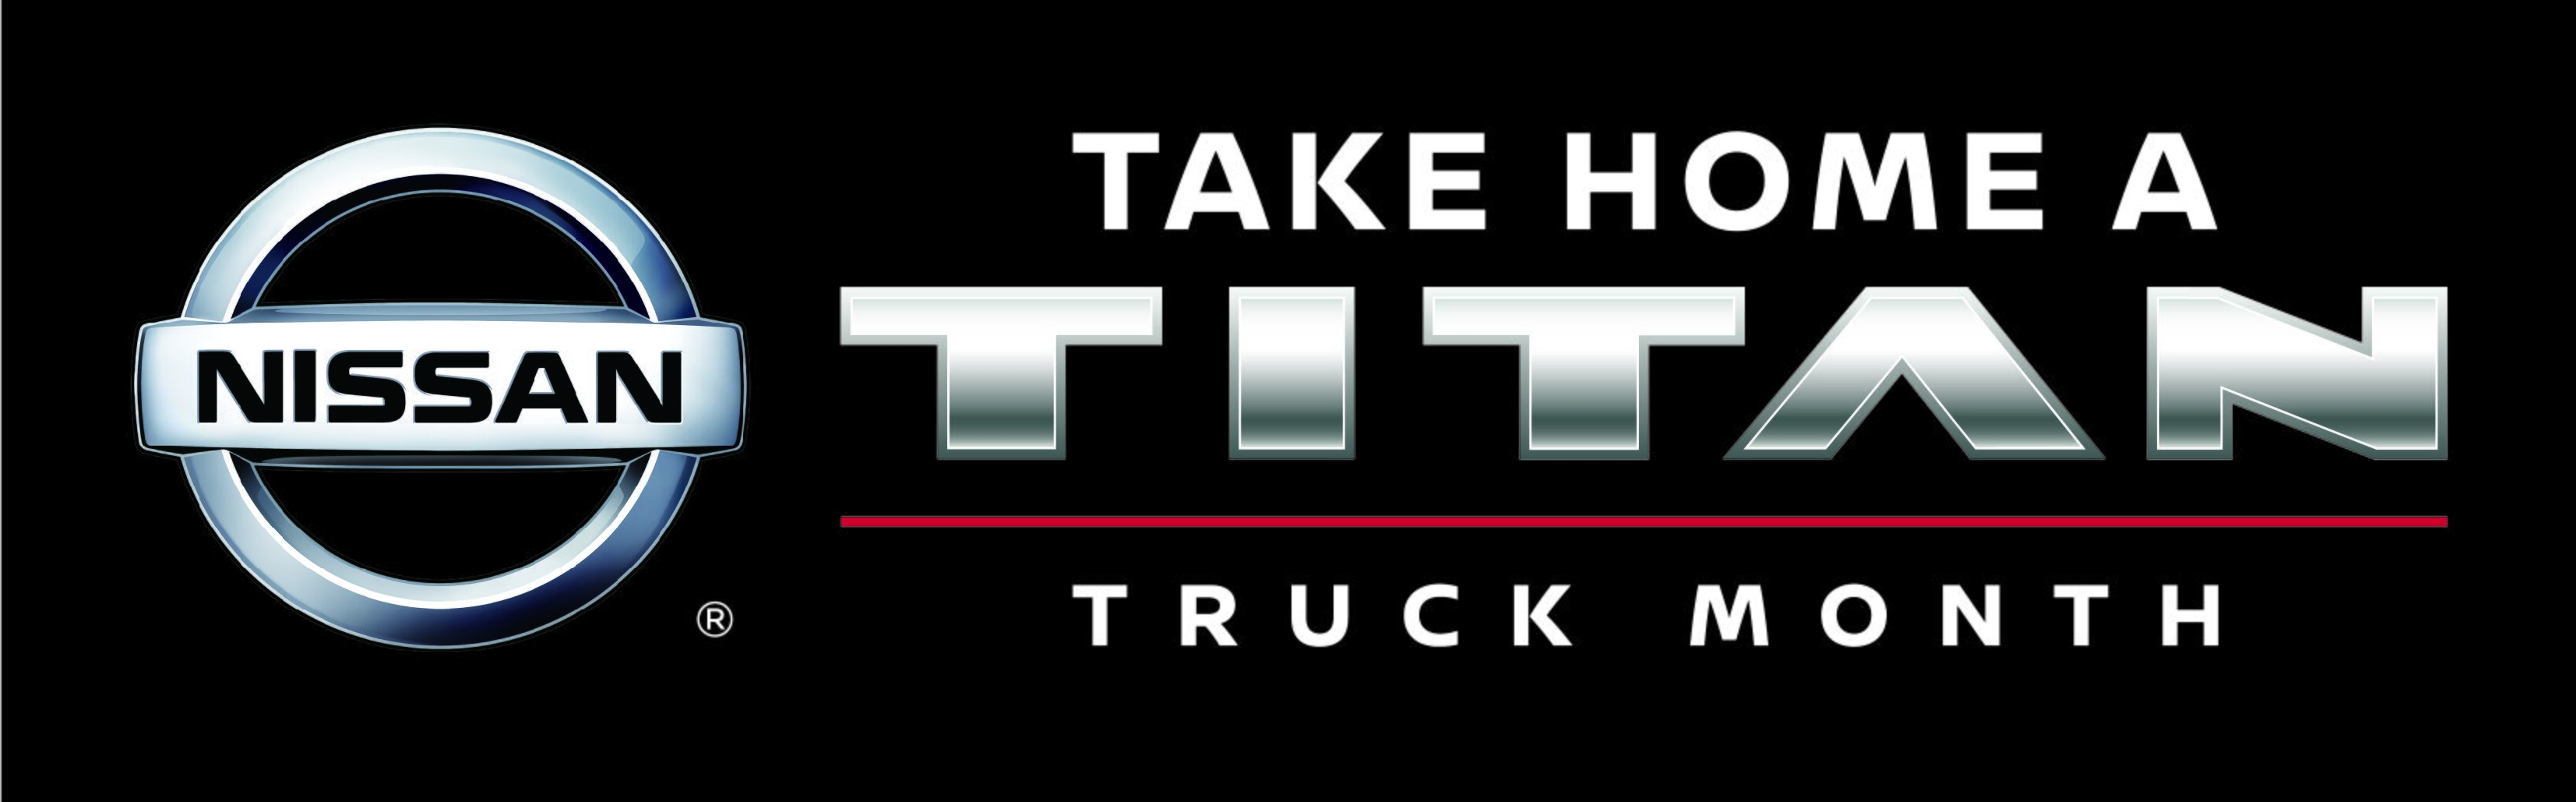 2018 nissan Truck Month